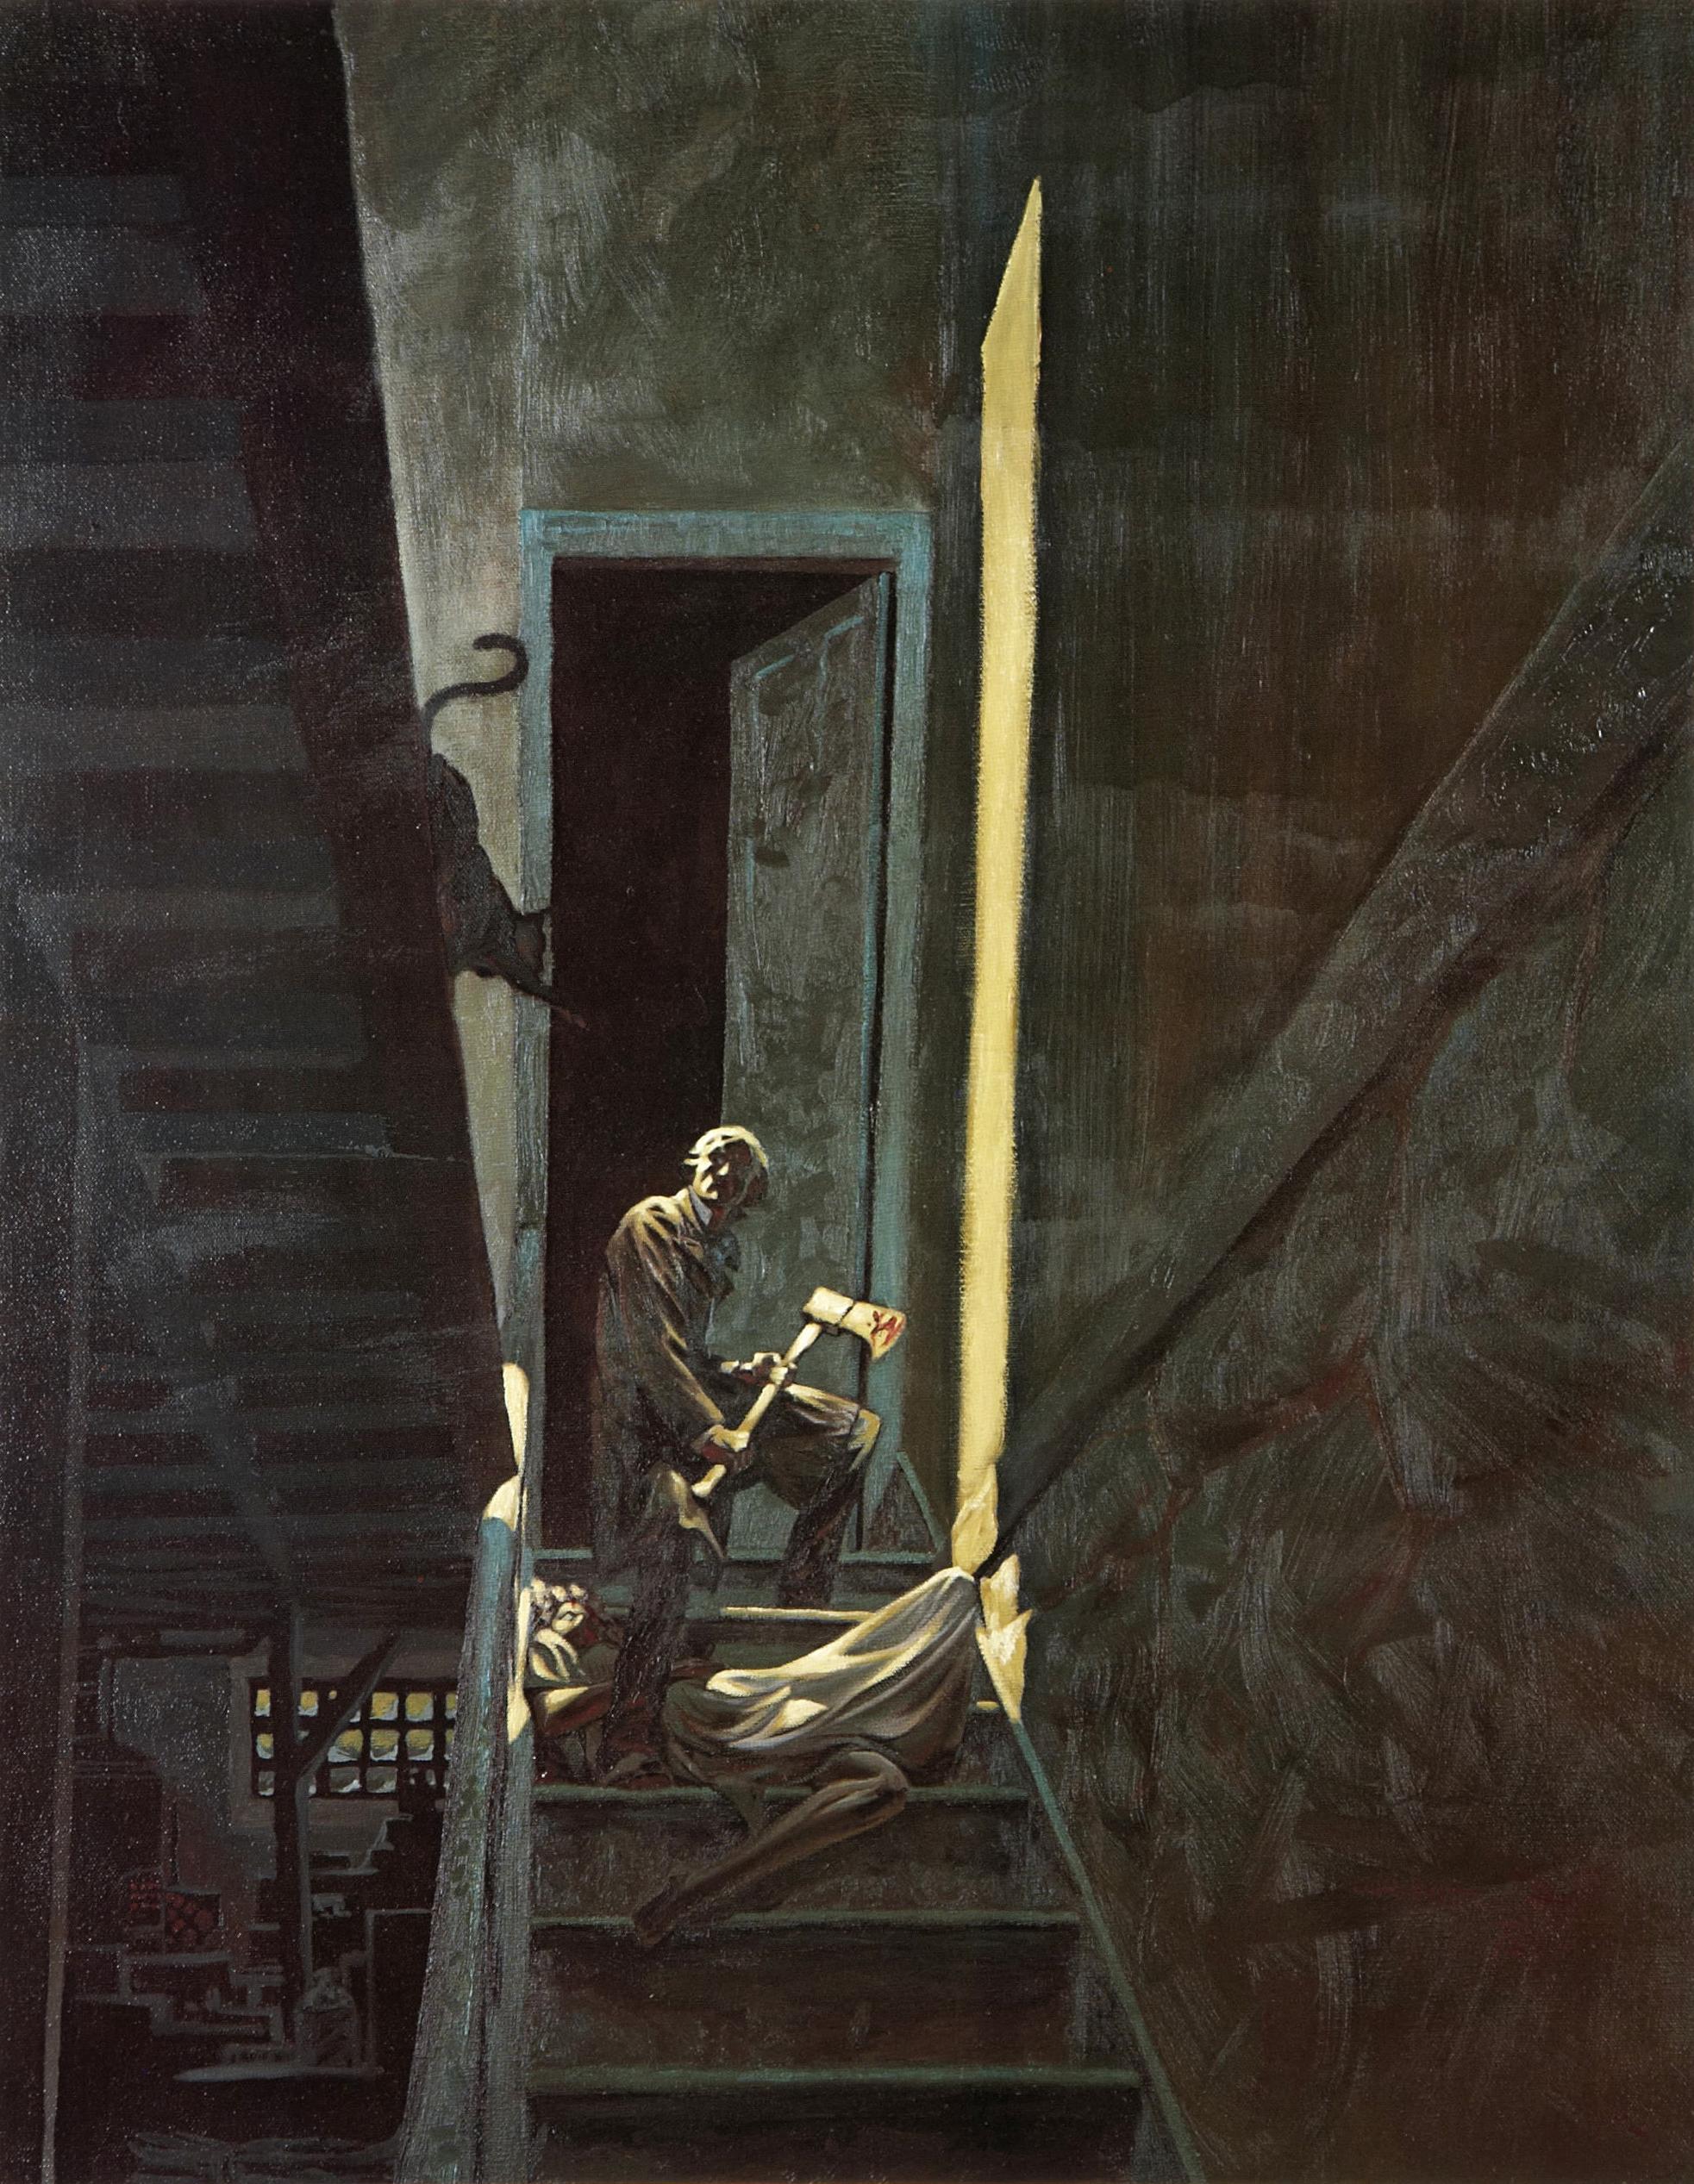 Berni Wrightson, The Black Cat, Edgar Allan Poe Bernie